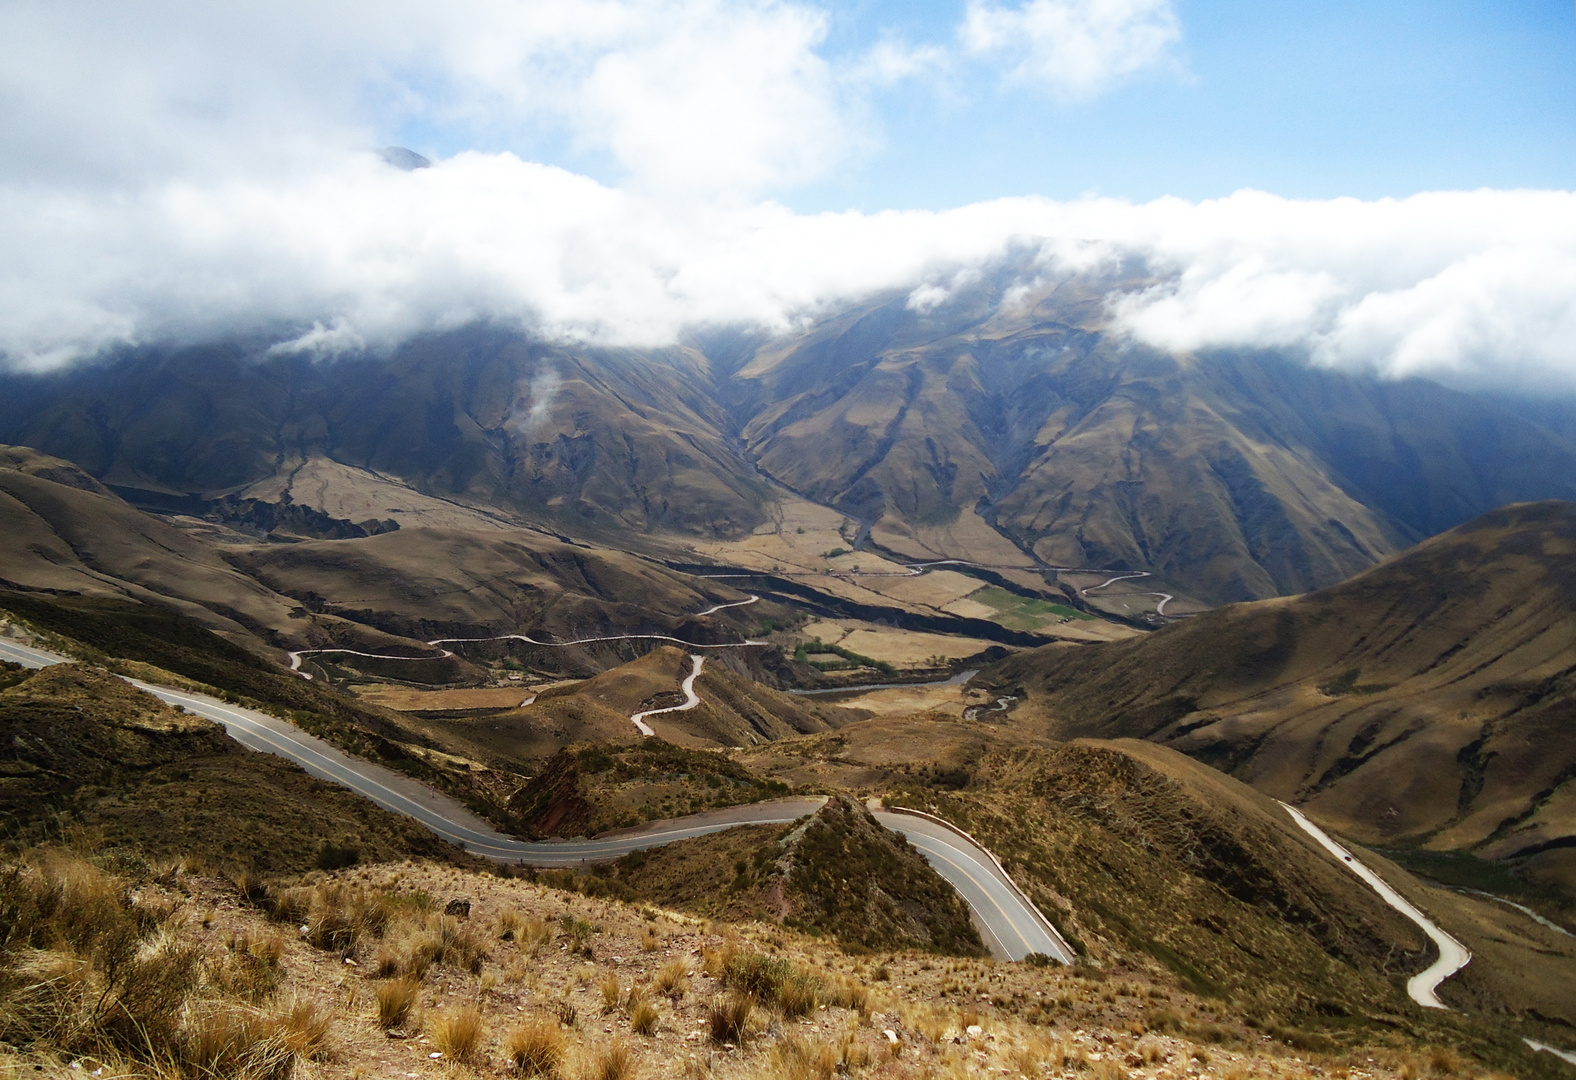 Cuesta del Obispo - Salta - Argentina